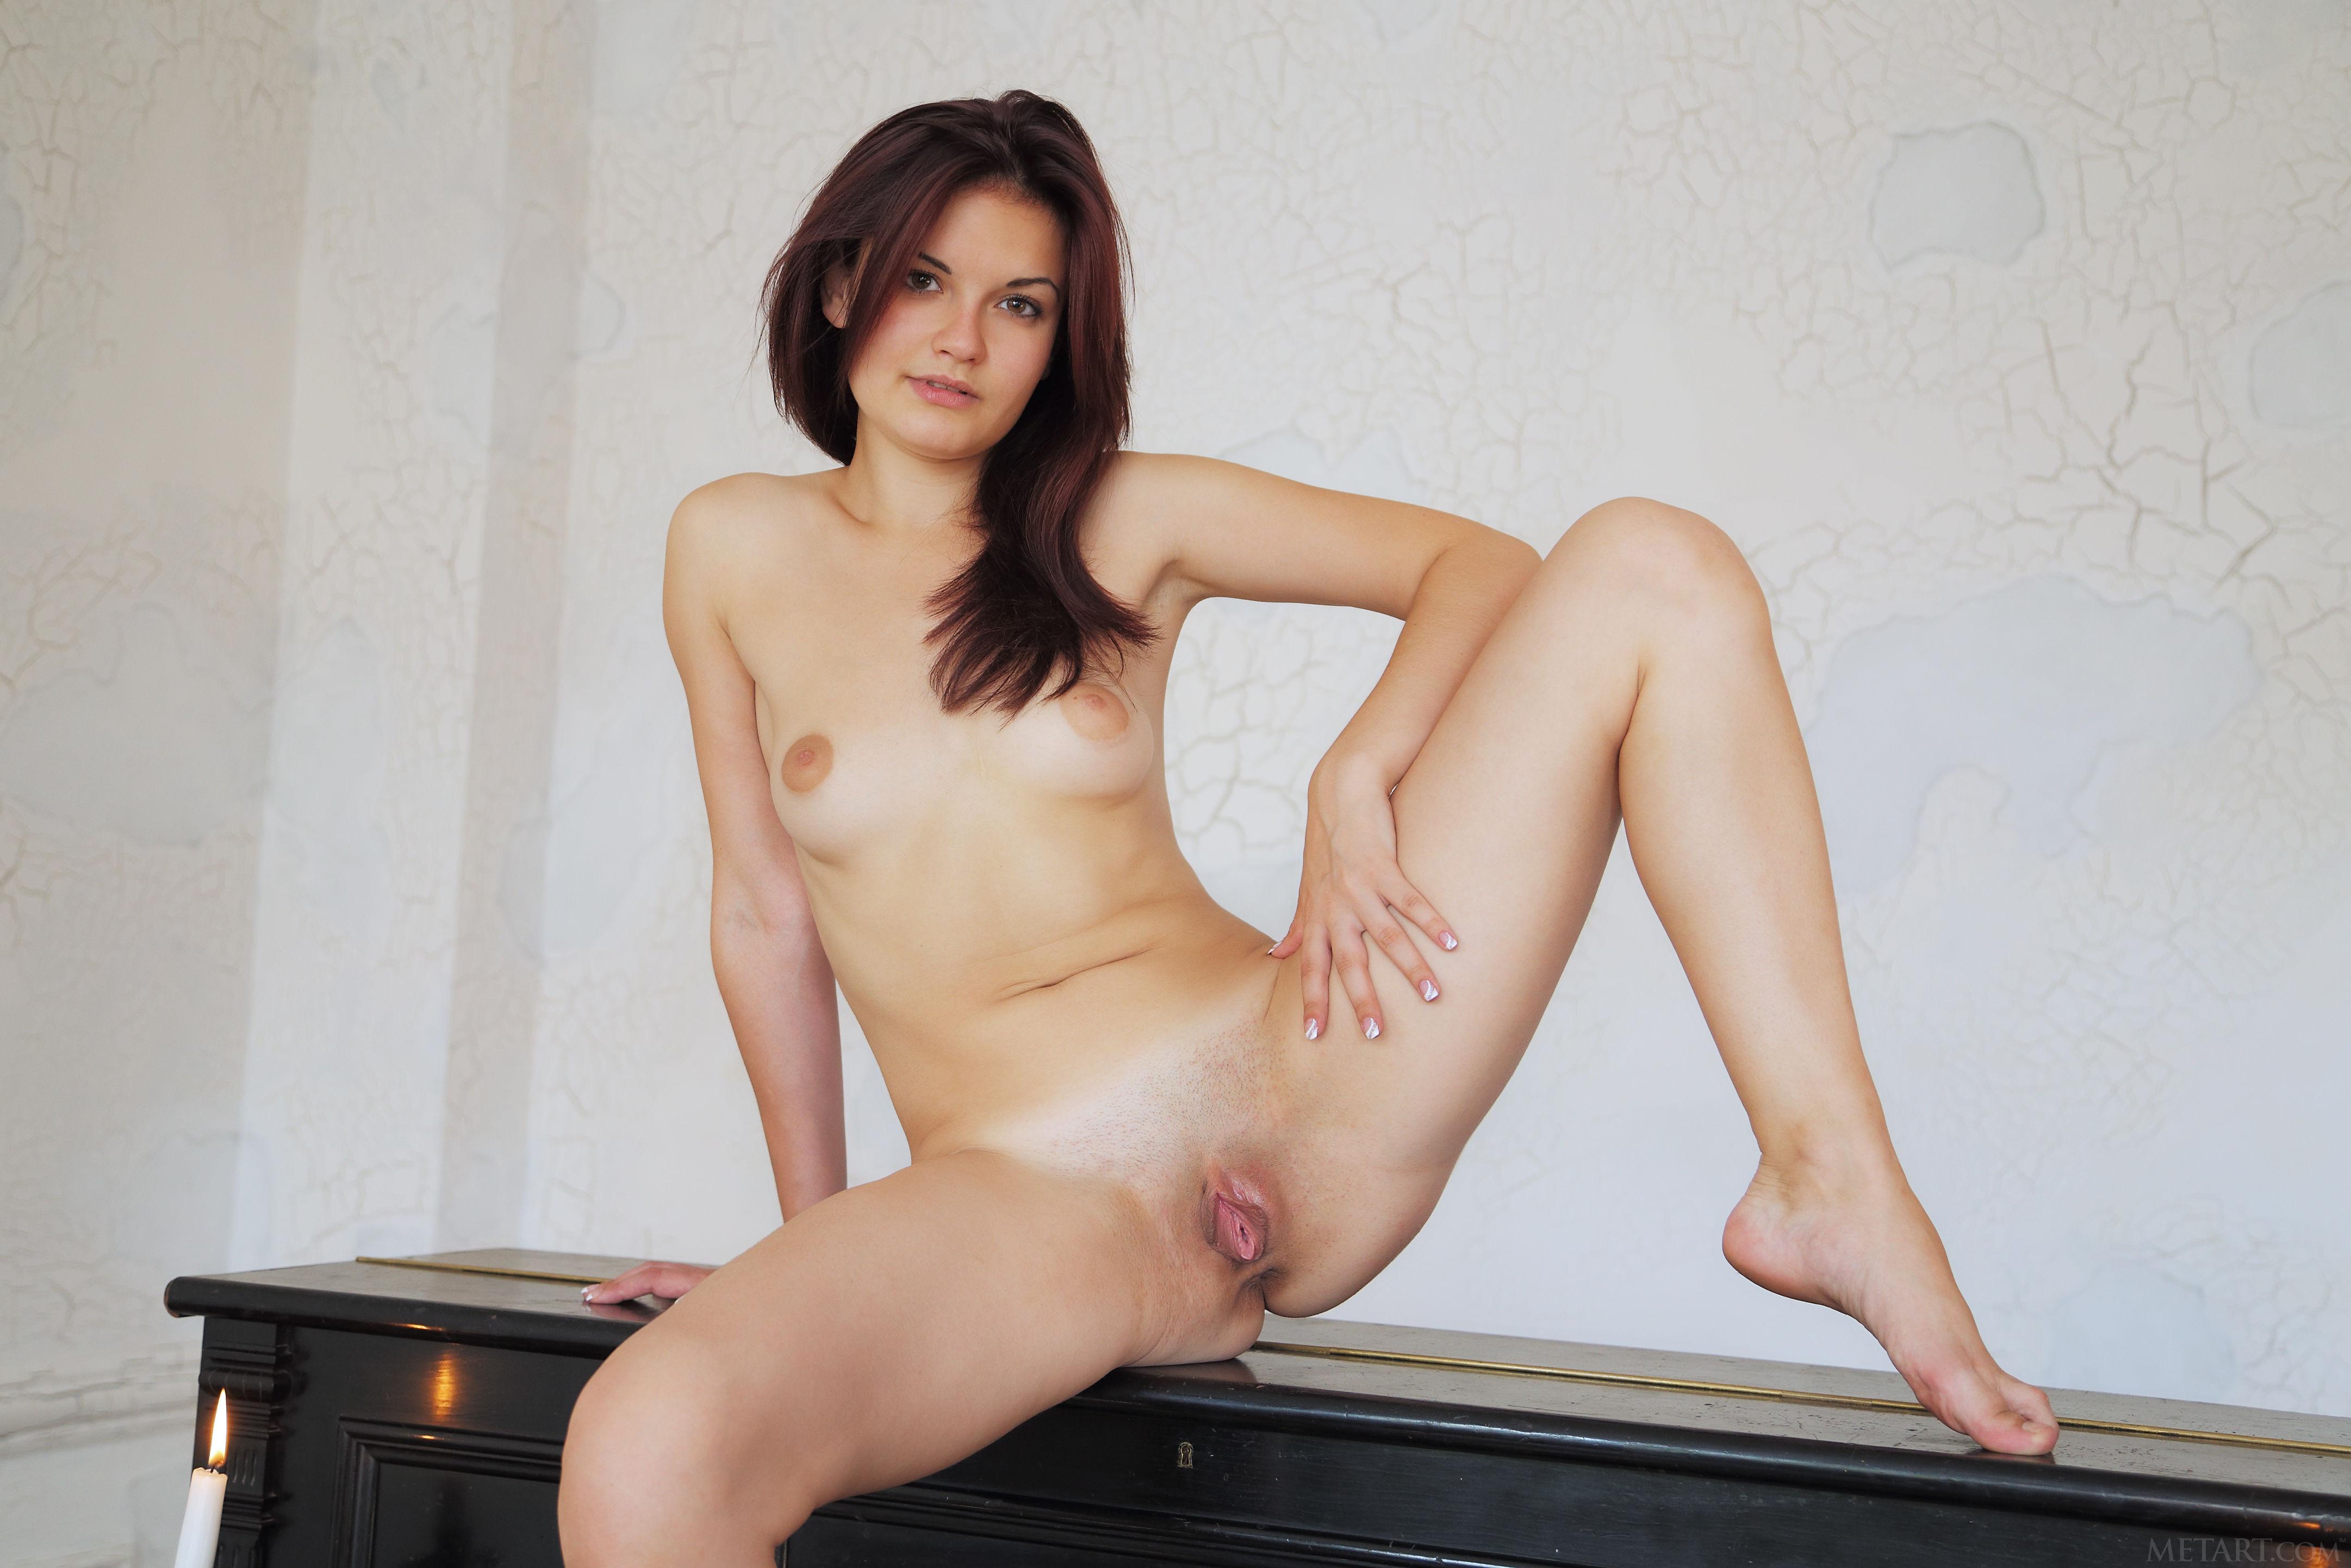 Wallpaper Dulcia, Brown Hair, Hi-Q, Small Breasts, Large -9548